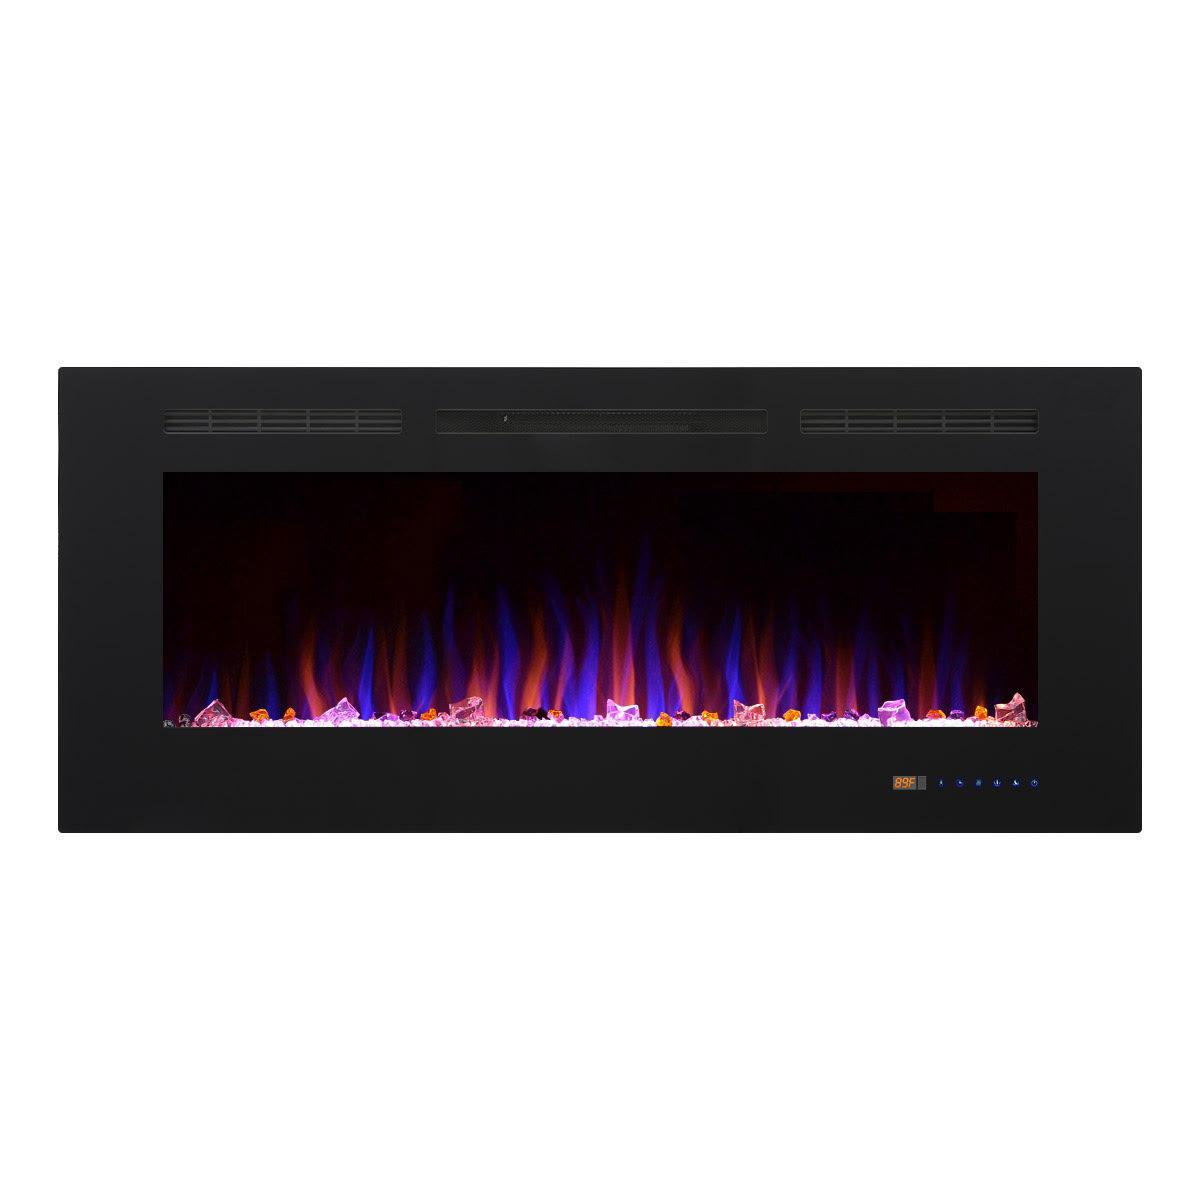 Електрокамін (вогнище) Royal Flame Royal Shine EF 36